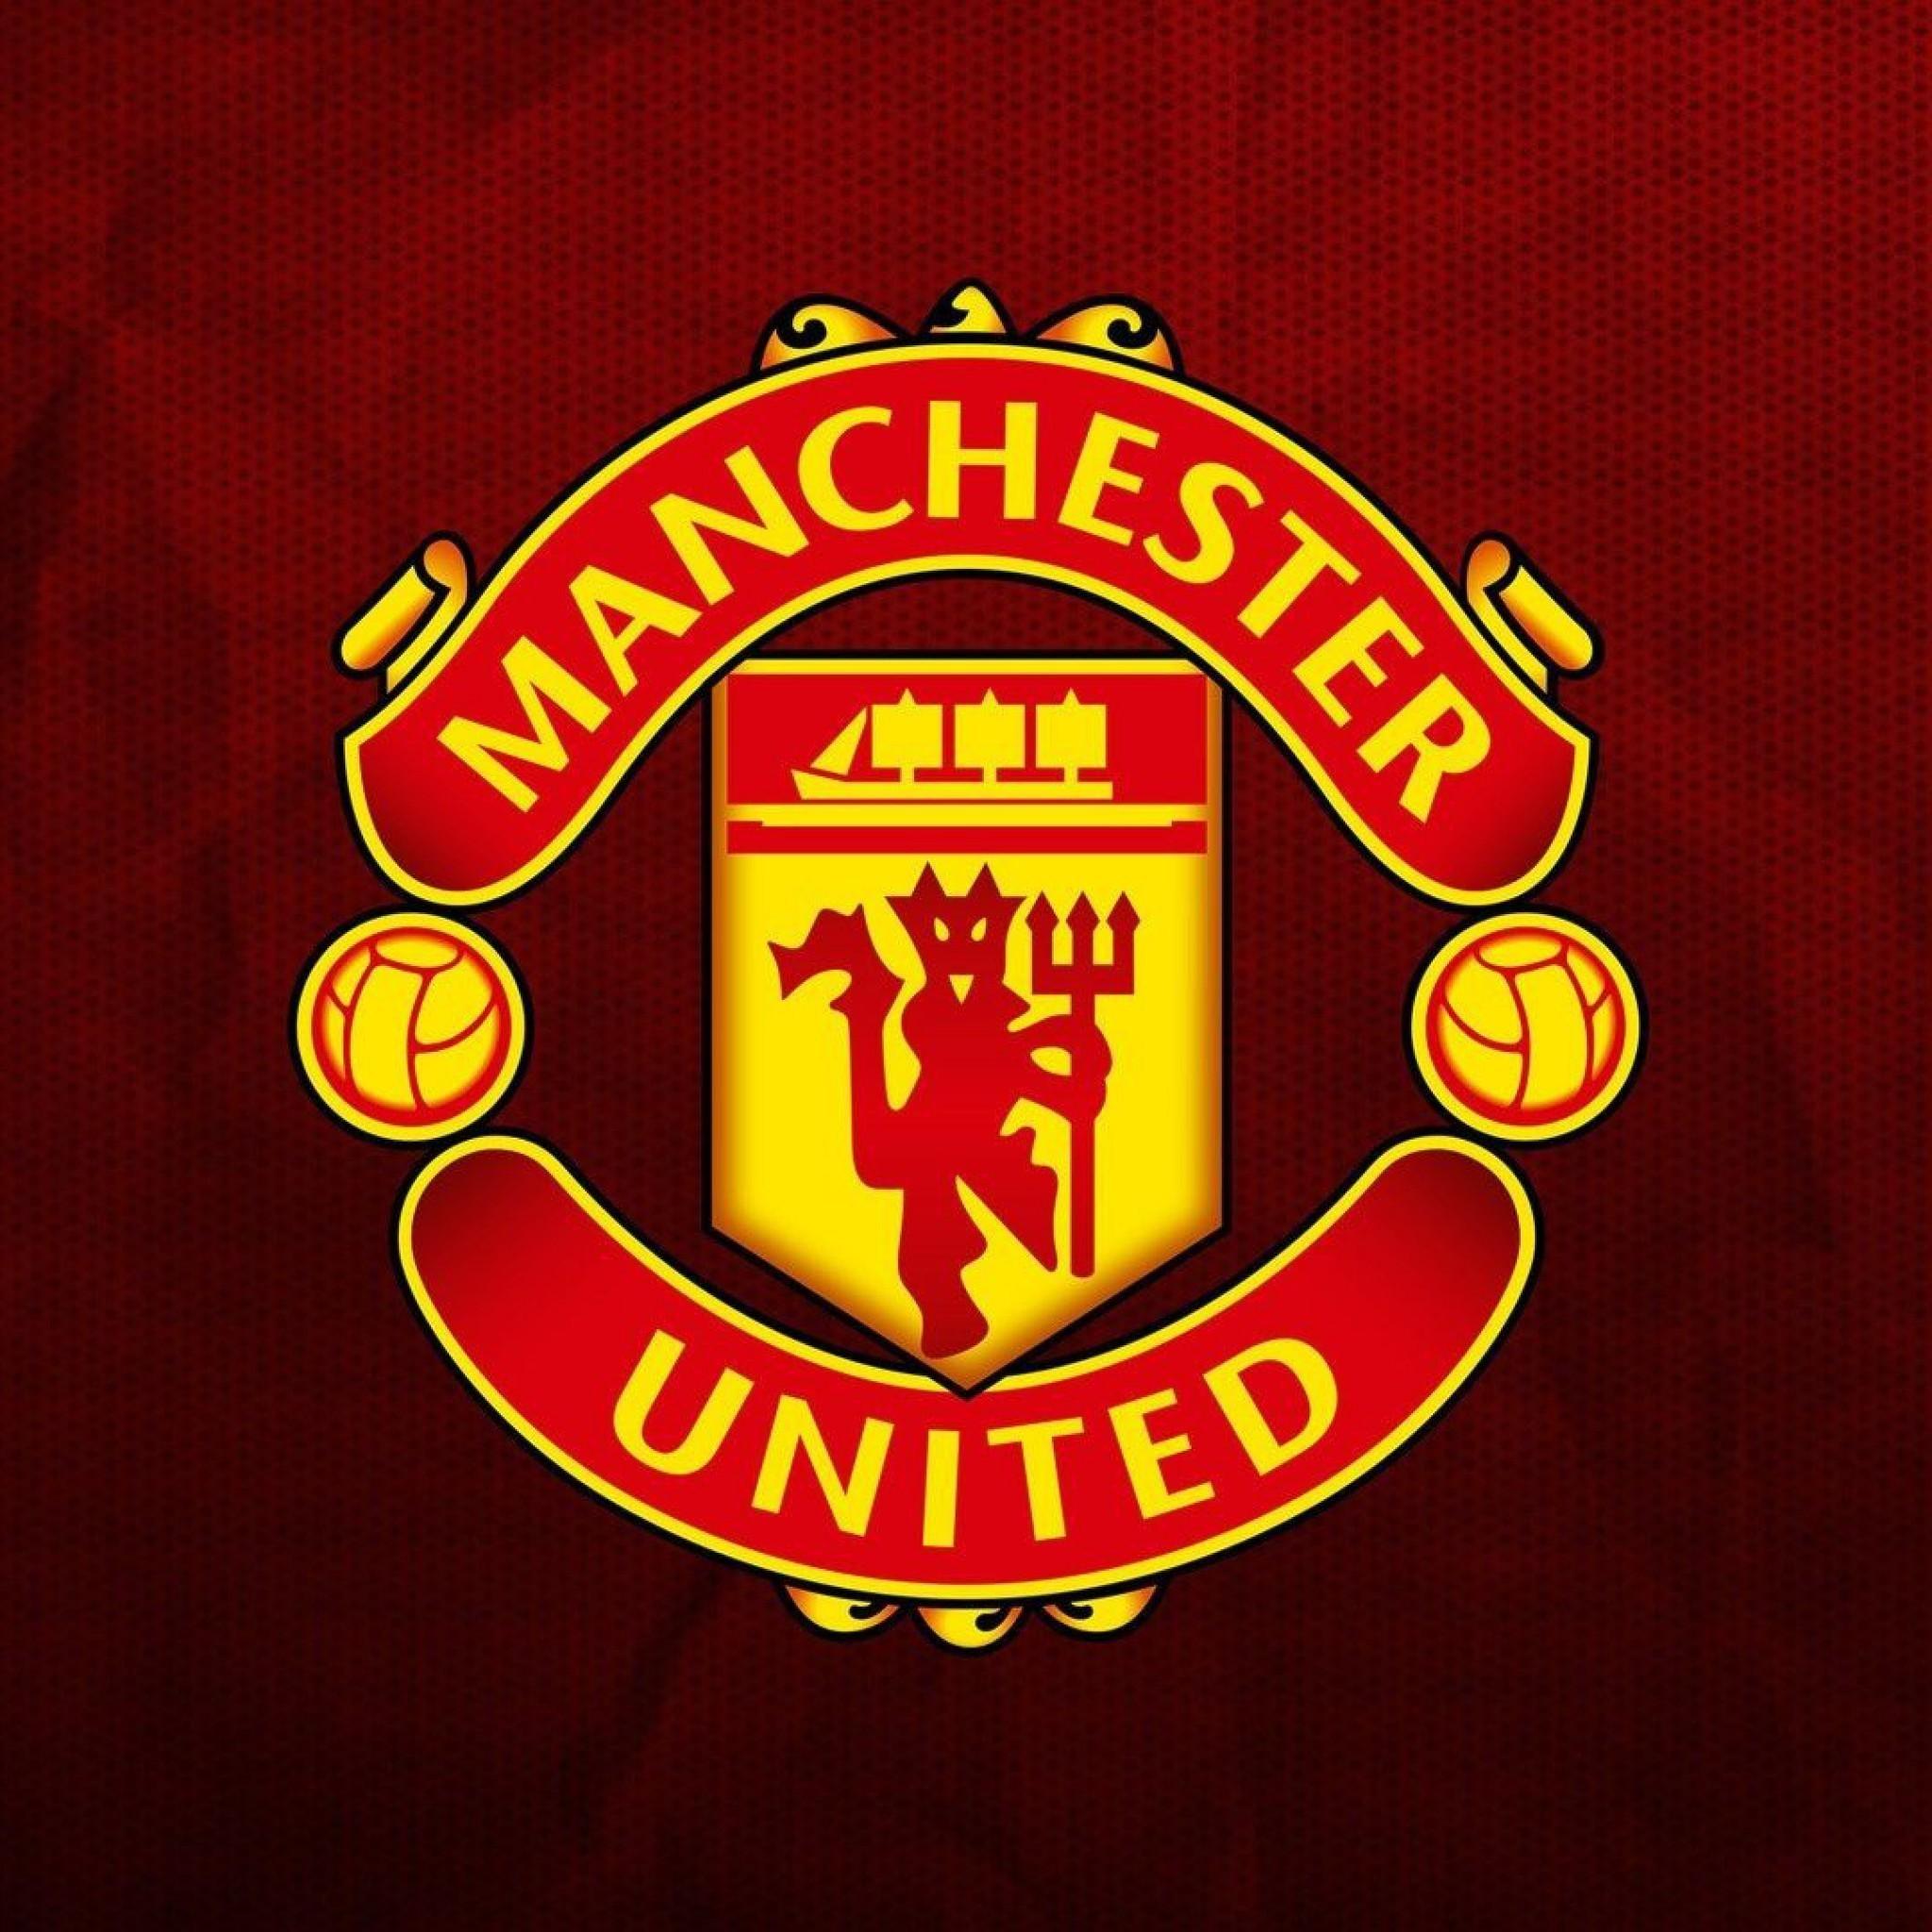 Daley Blind Wallpaper: Wallpaper Logo Manchester United 2018 ·①